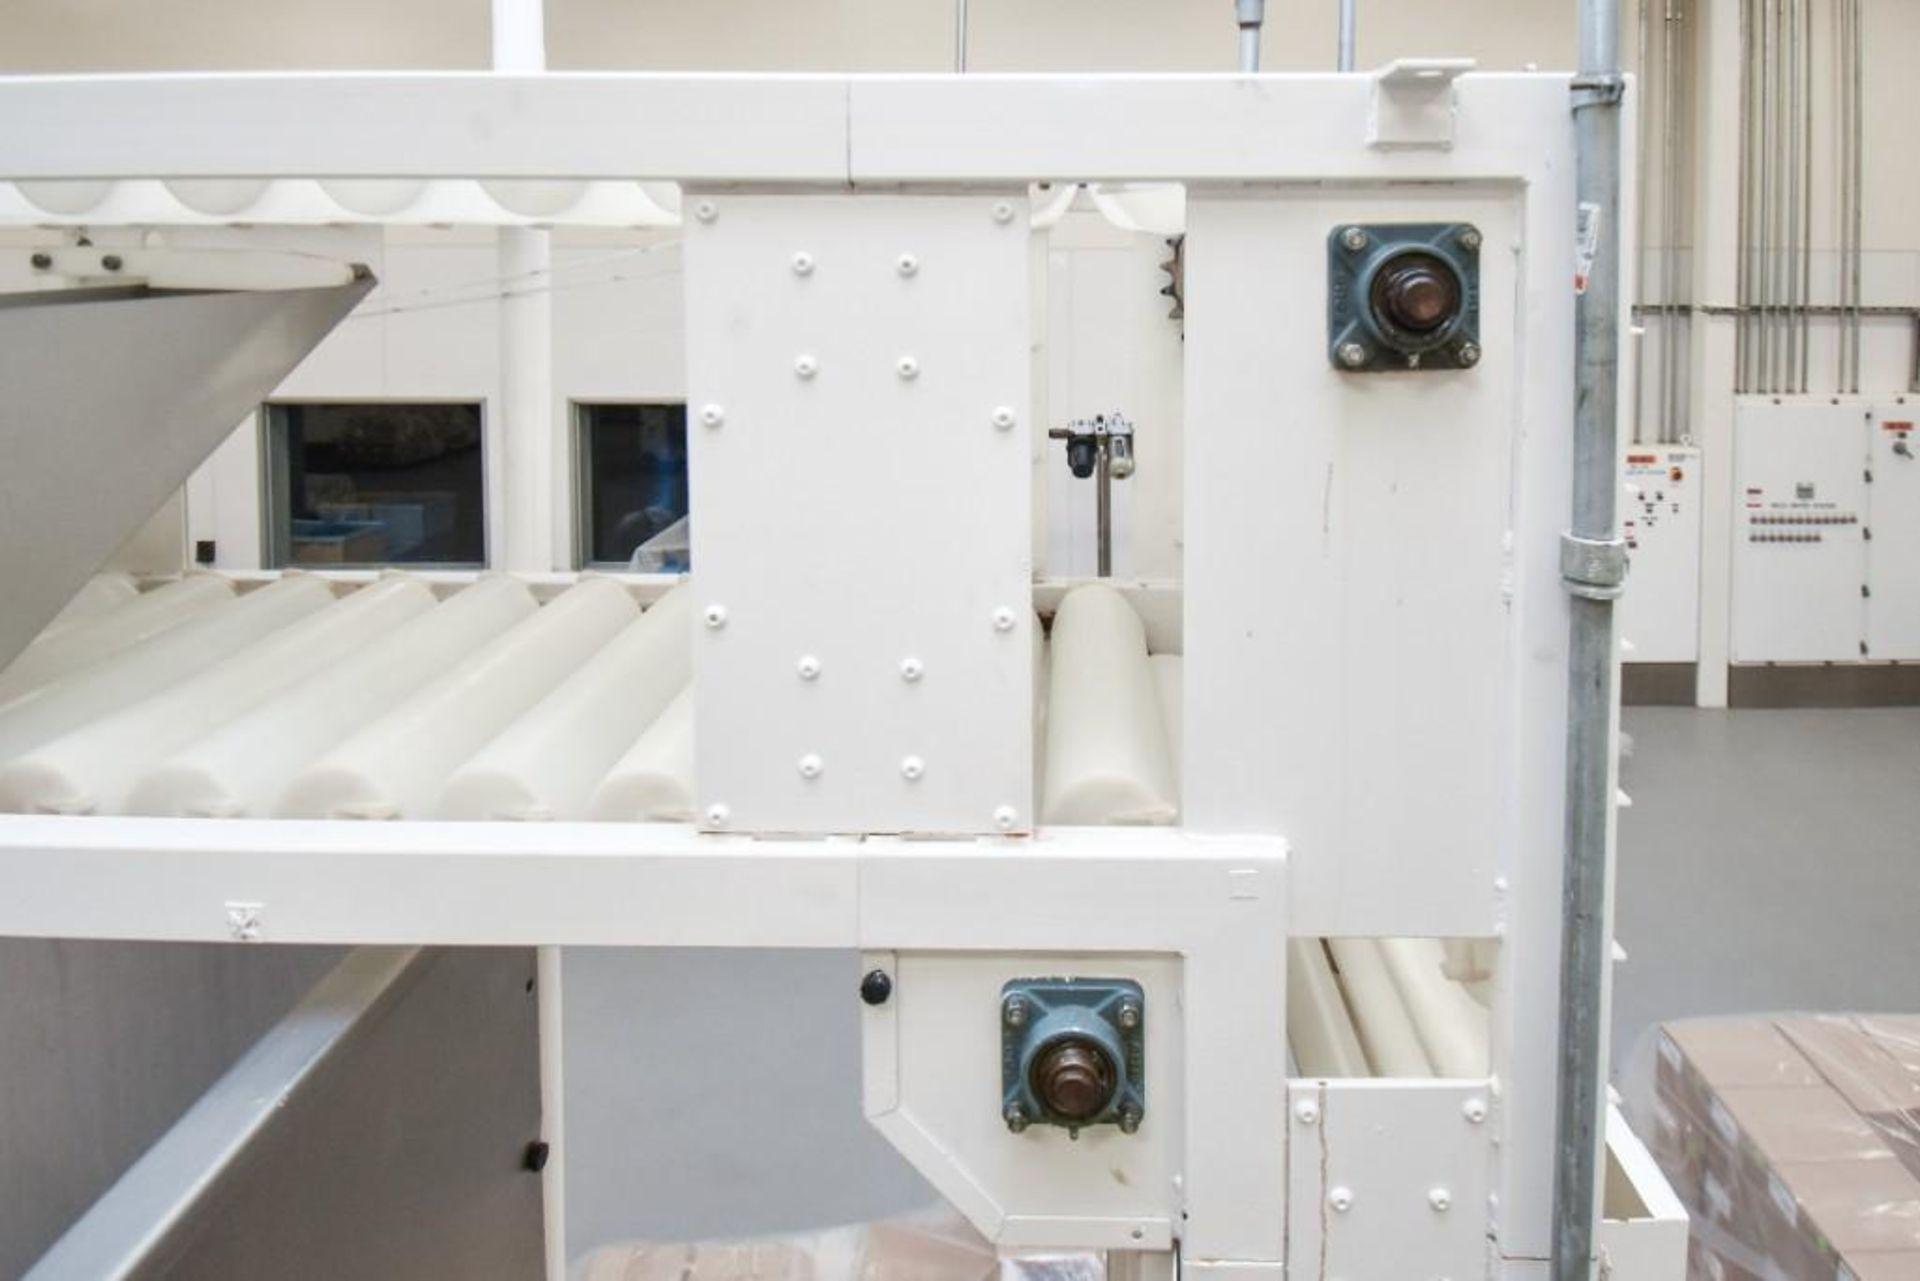 RBM Accumulation Hopper Conveyor and Vibratory Deck AC-1-4X4-6 - Image 8 of 11